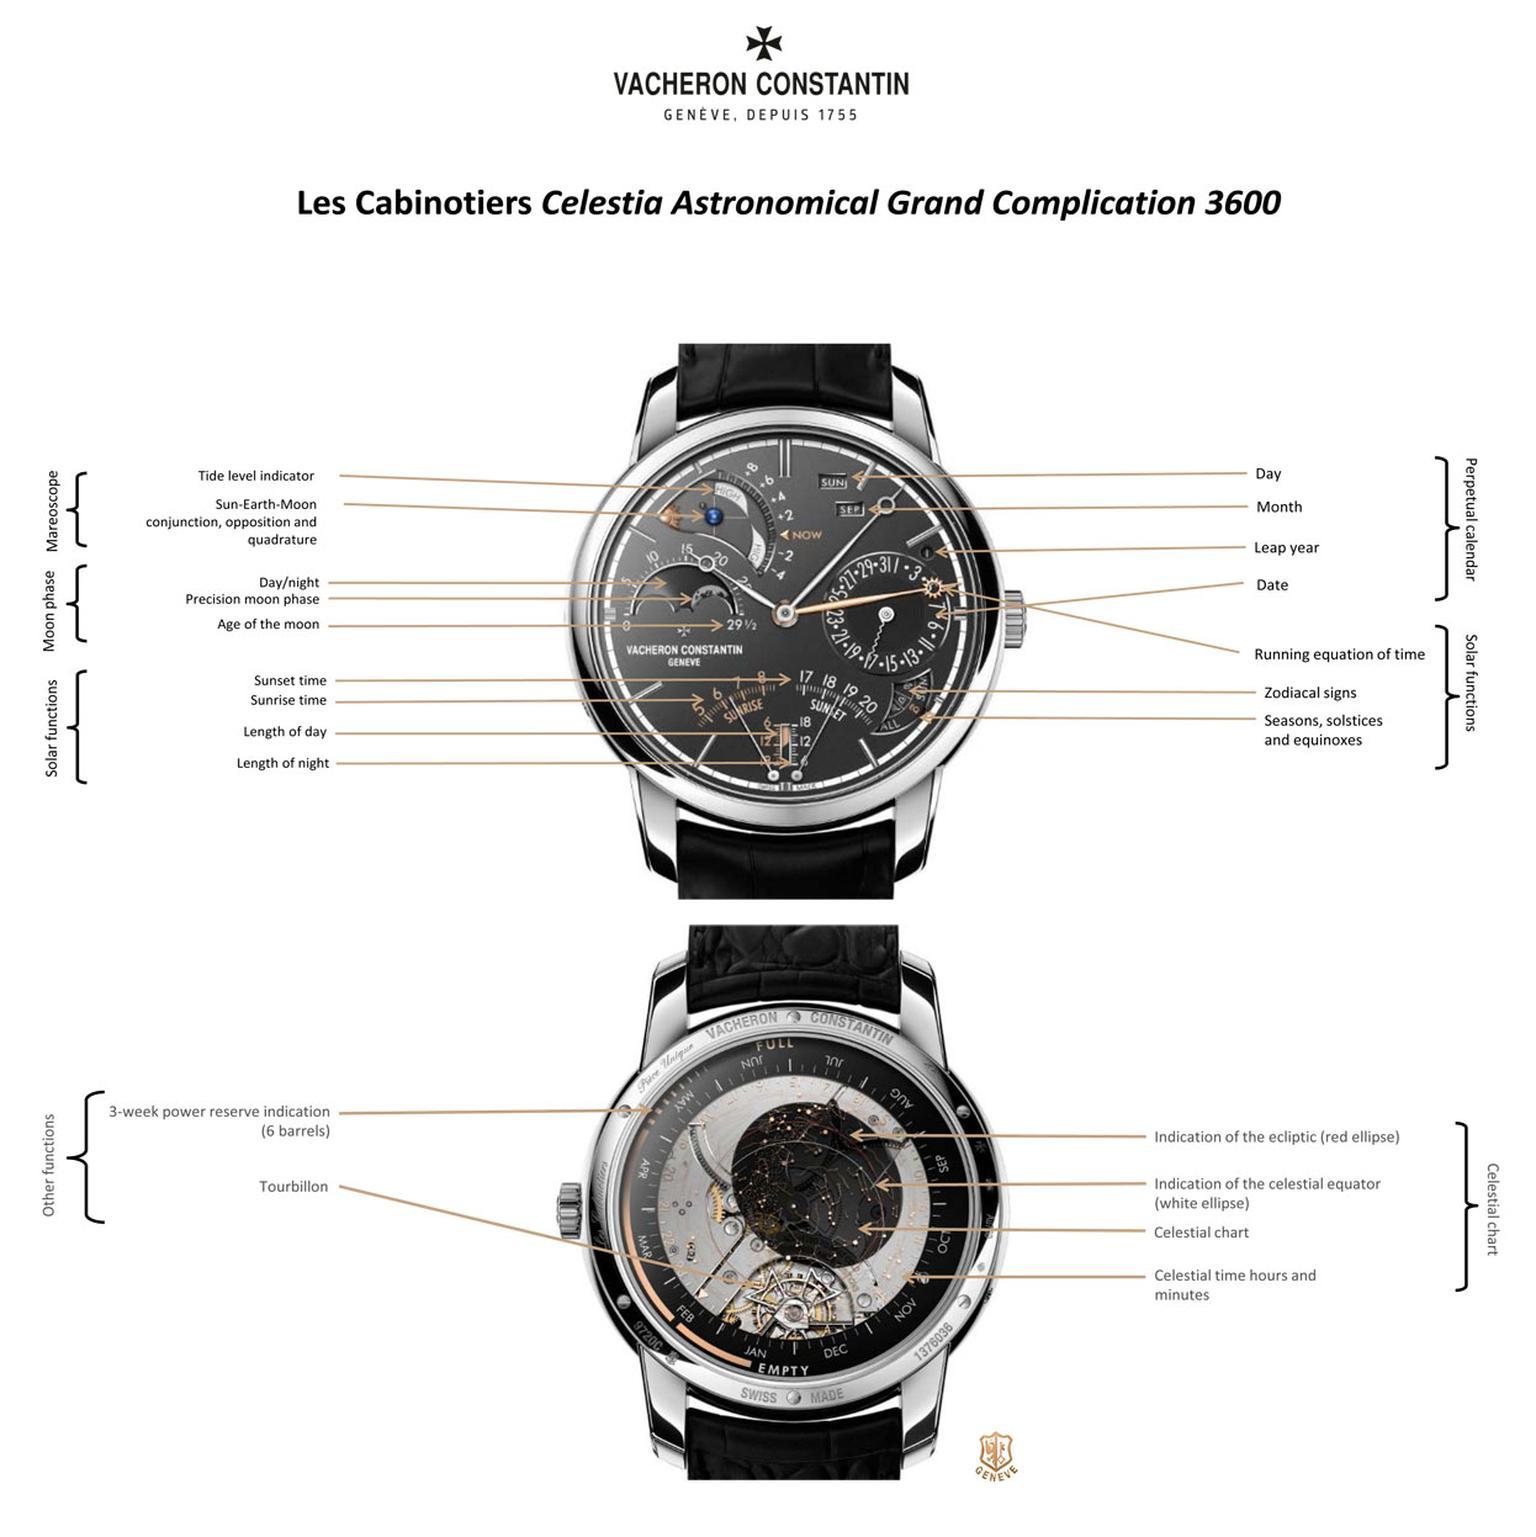 Les Cabinotiers Celestia Astronomical Grand Complication